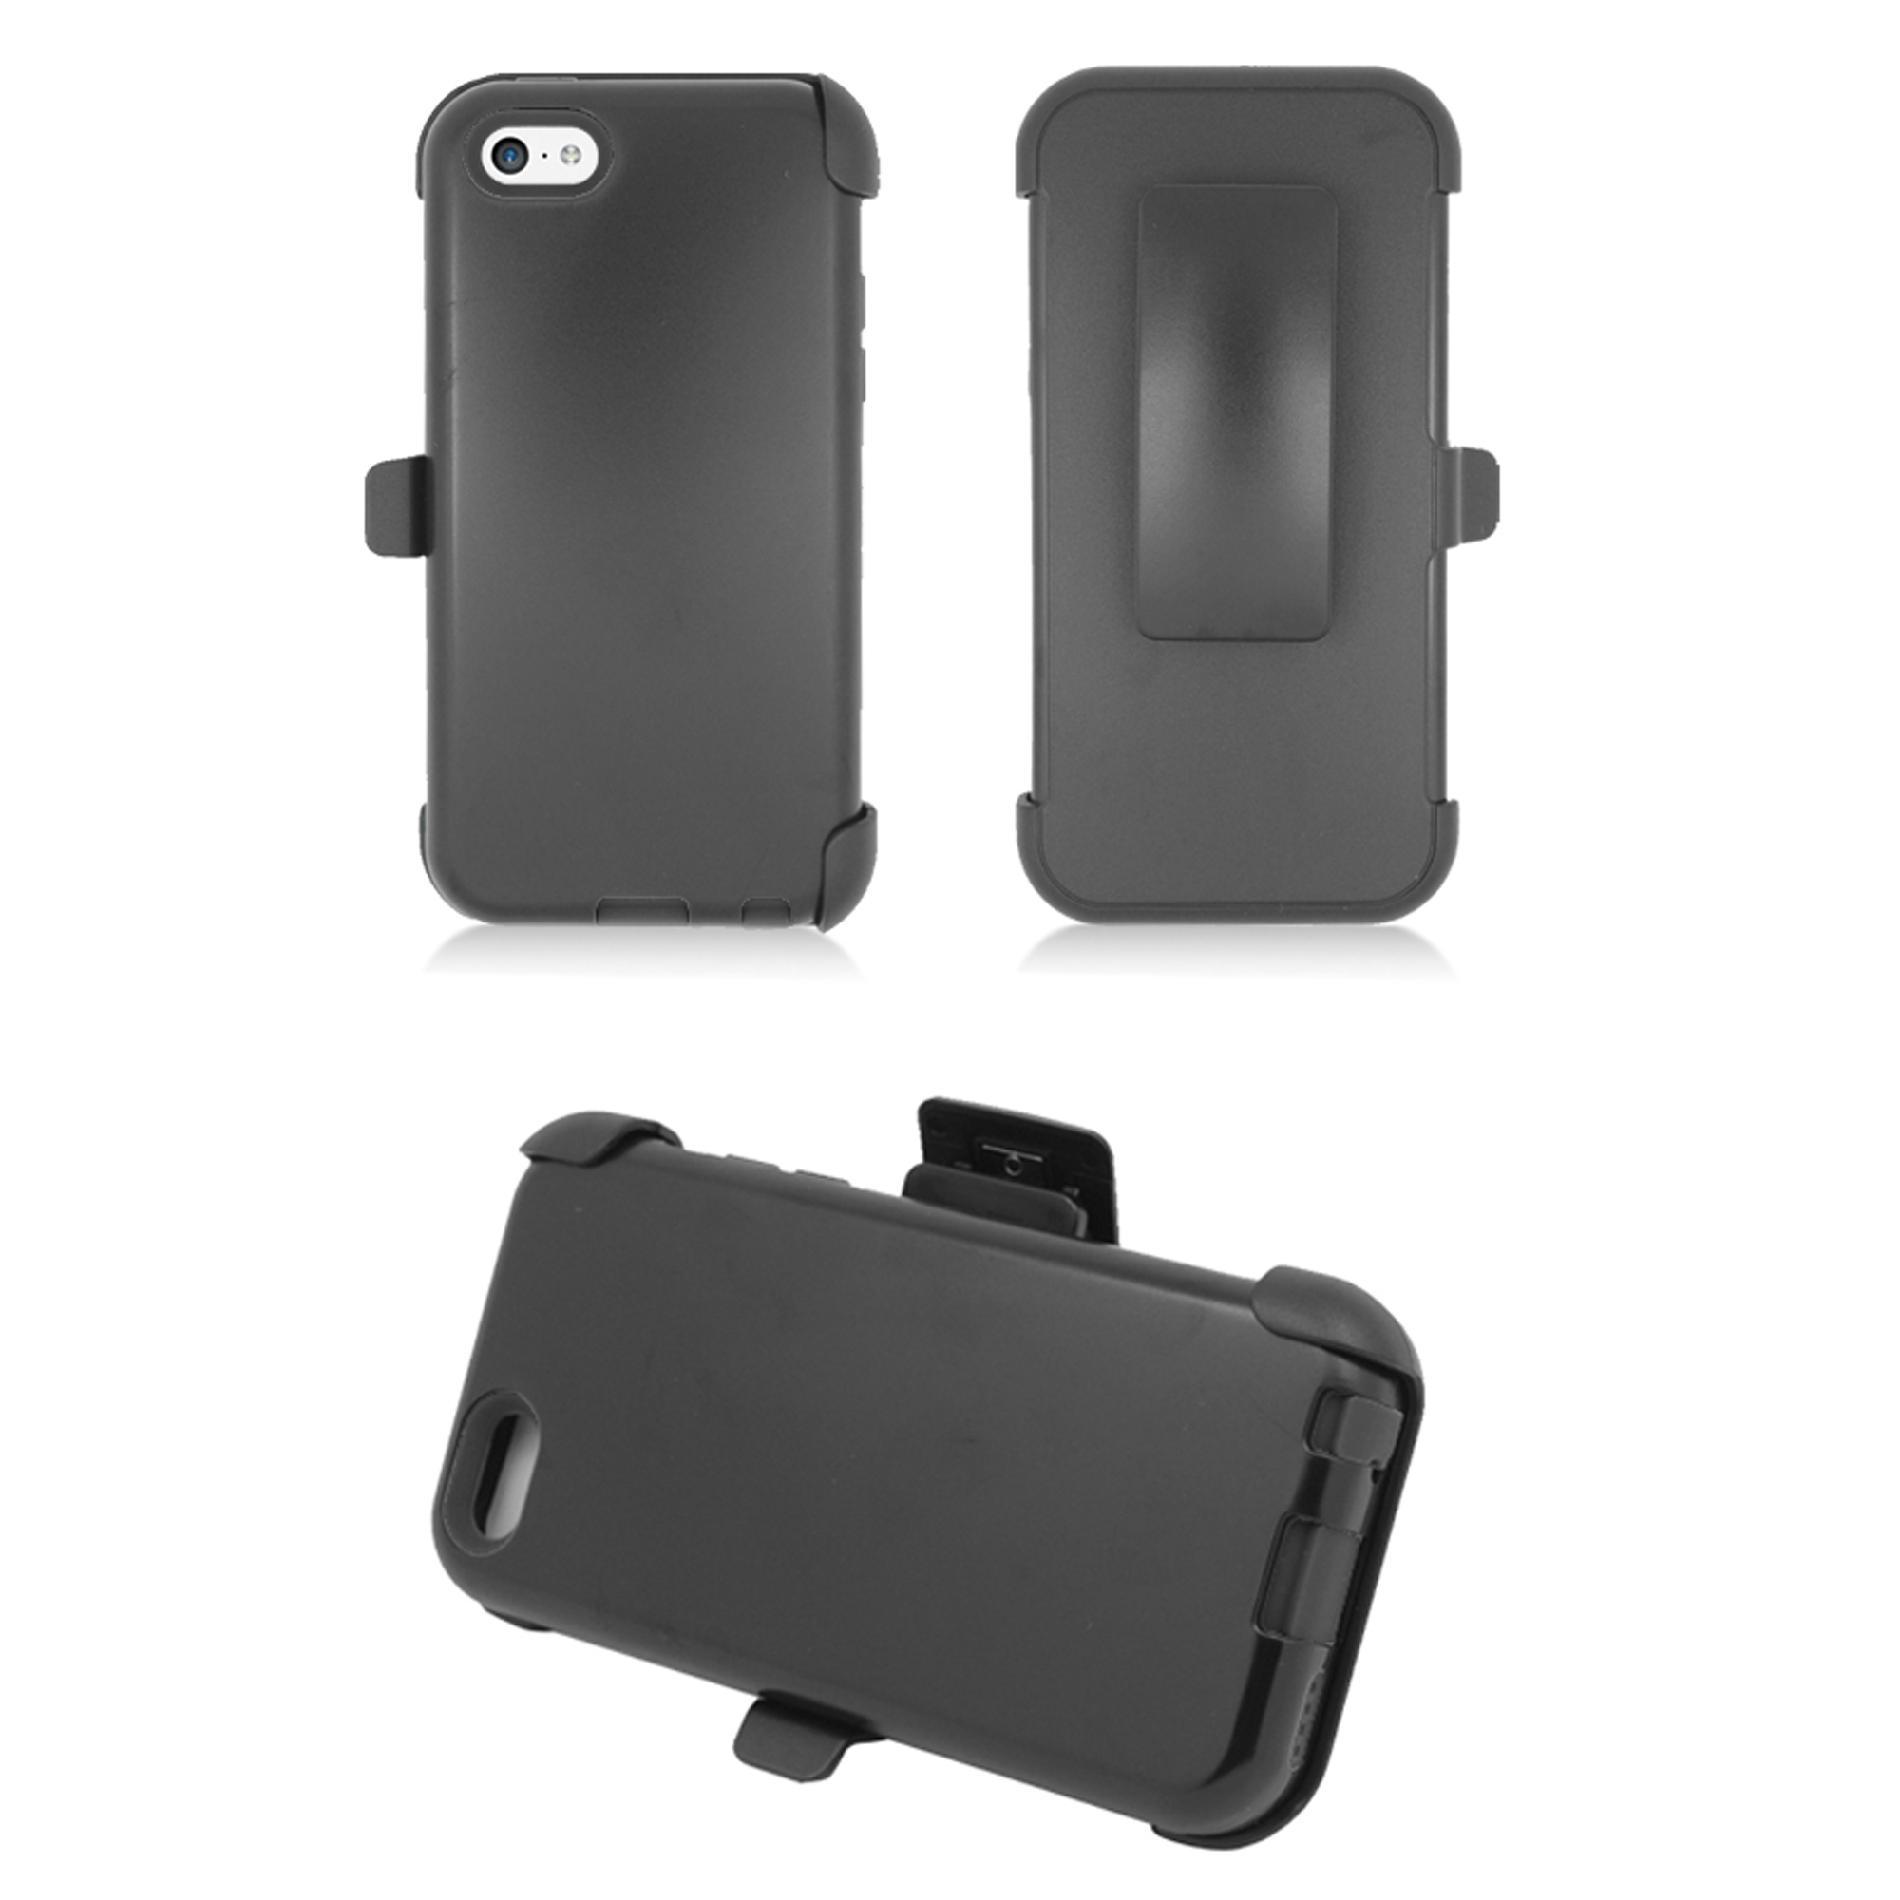 KTA 3784 iPhone 5C Rubber Case and Holster, Black at Kmart.com